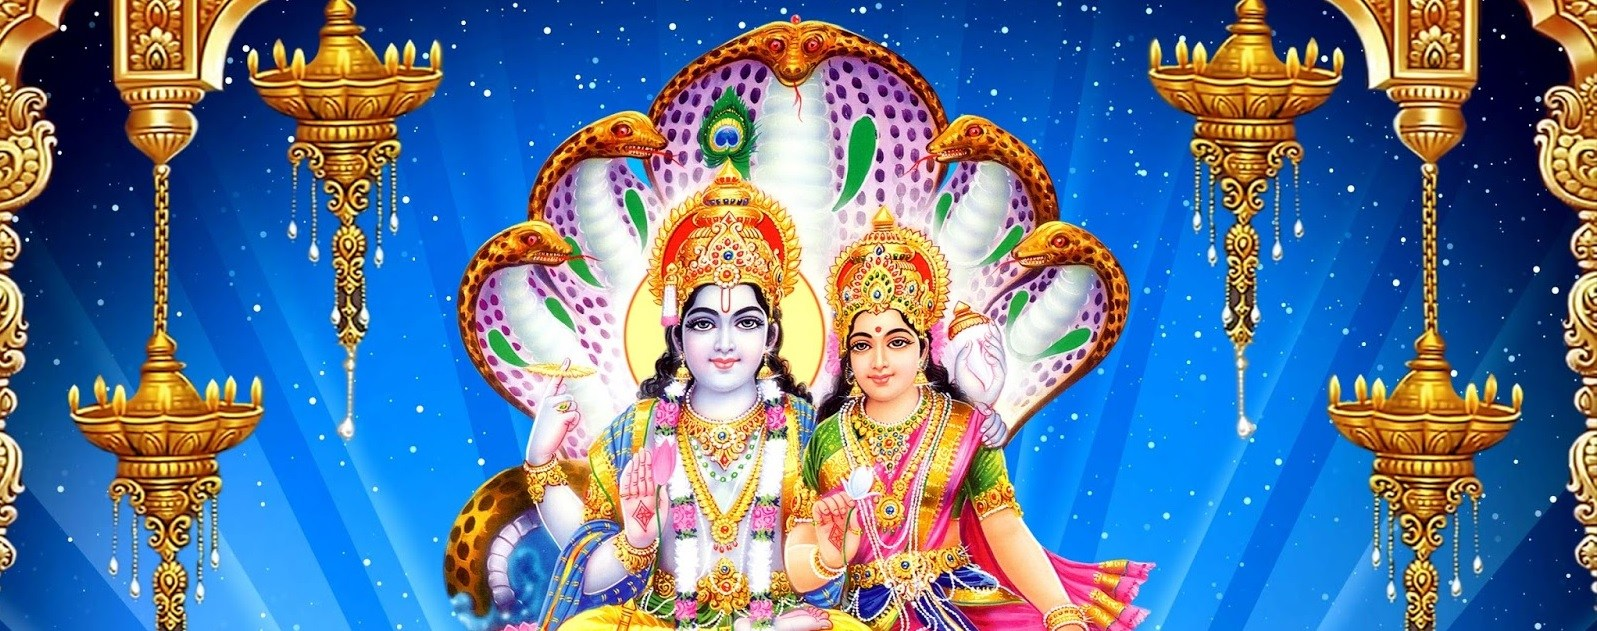 PunjabKesari, Sri Vishnu Lakshmi, Papmochani Ekadashi